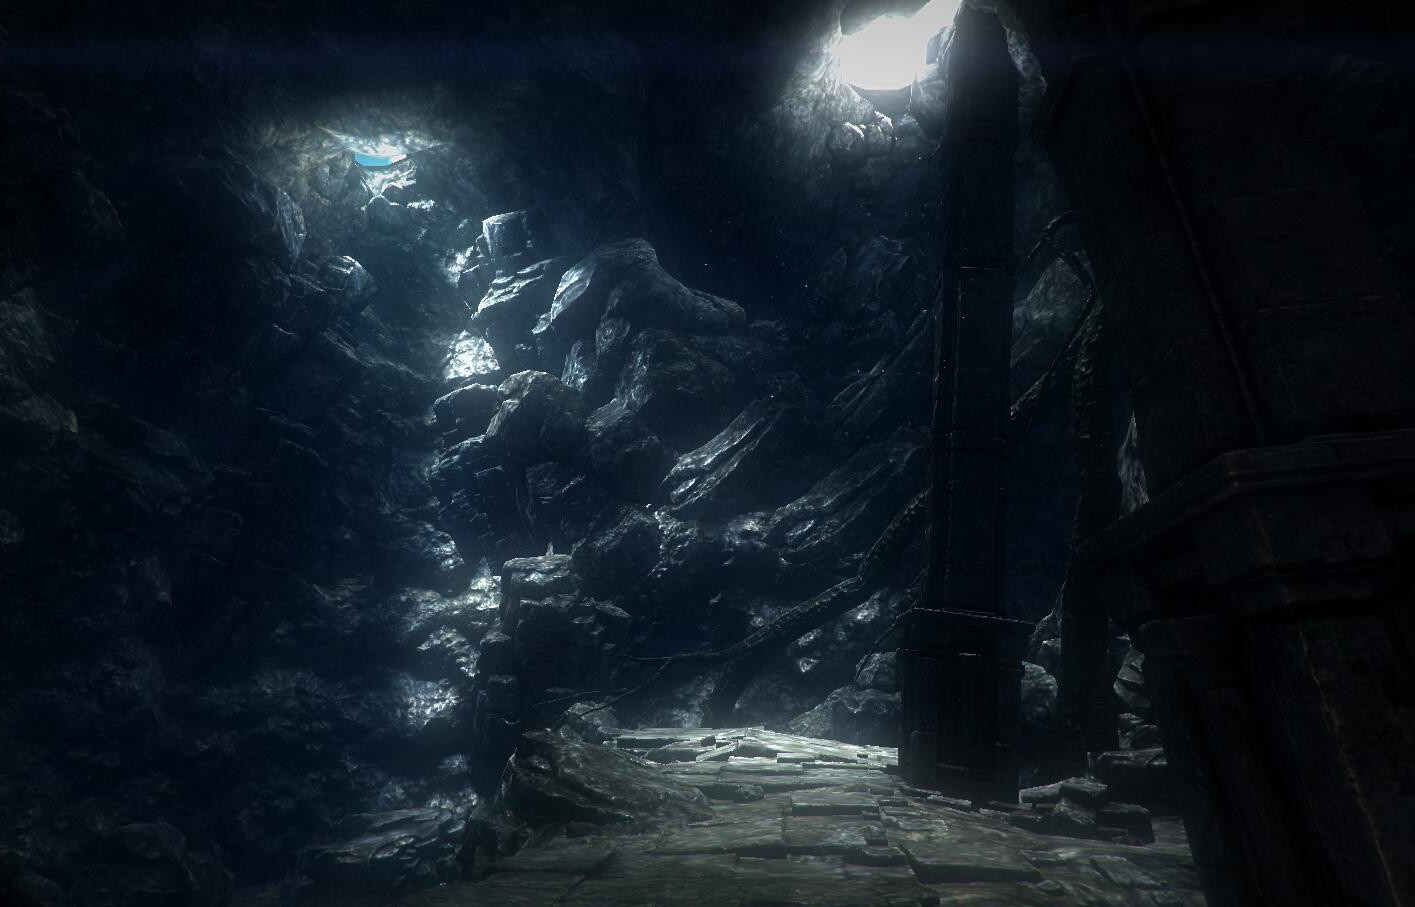 Underworld Cave Environment unity3d